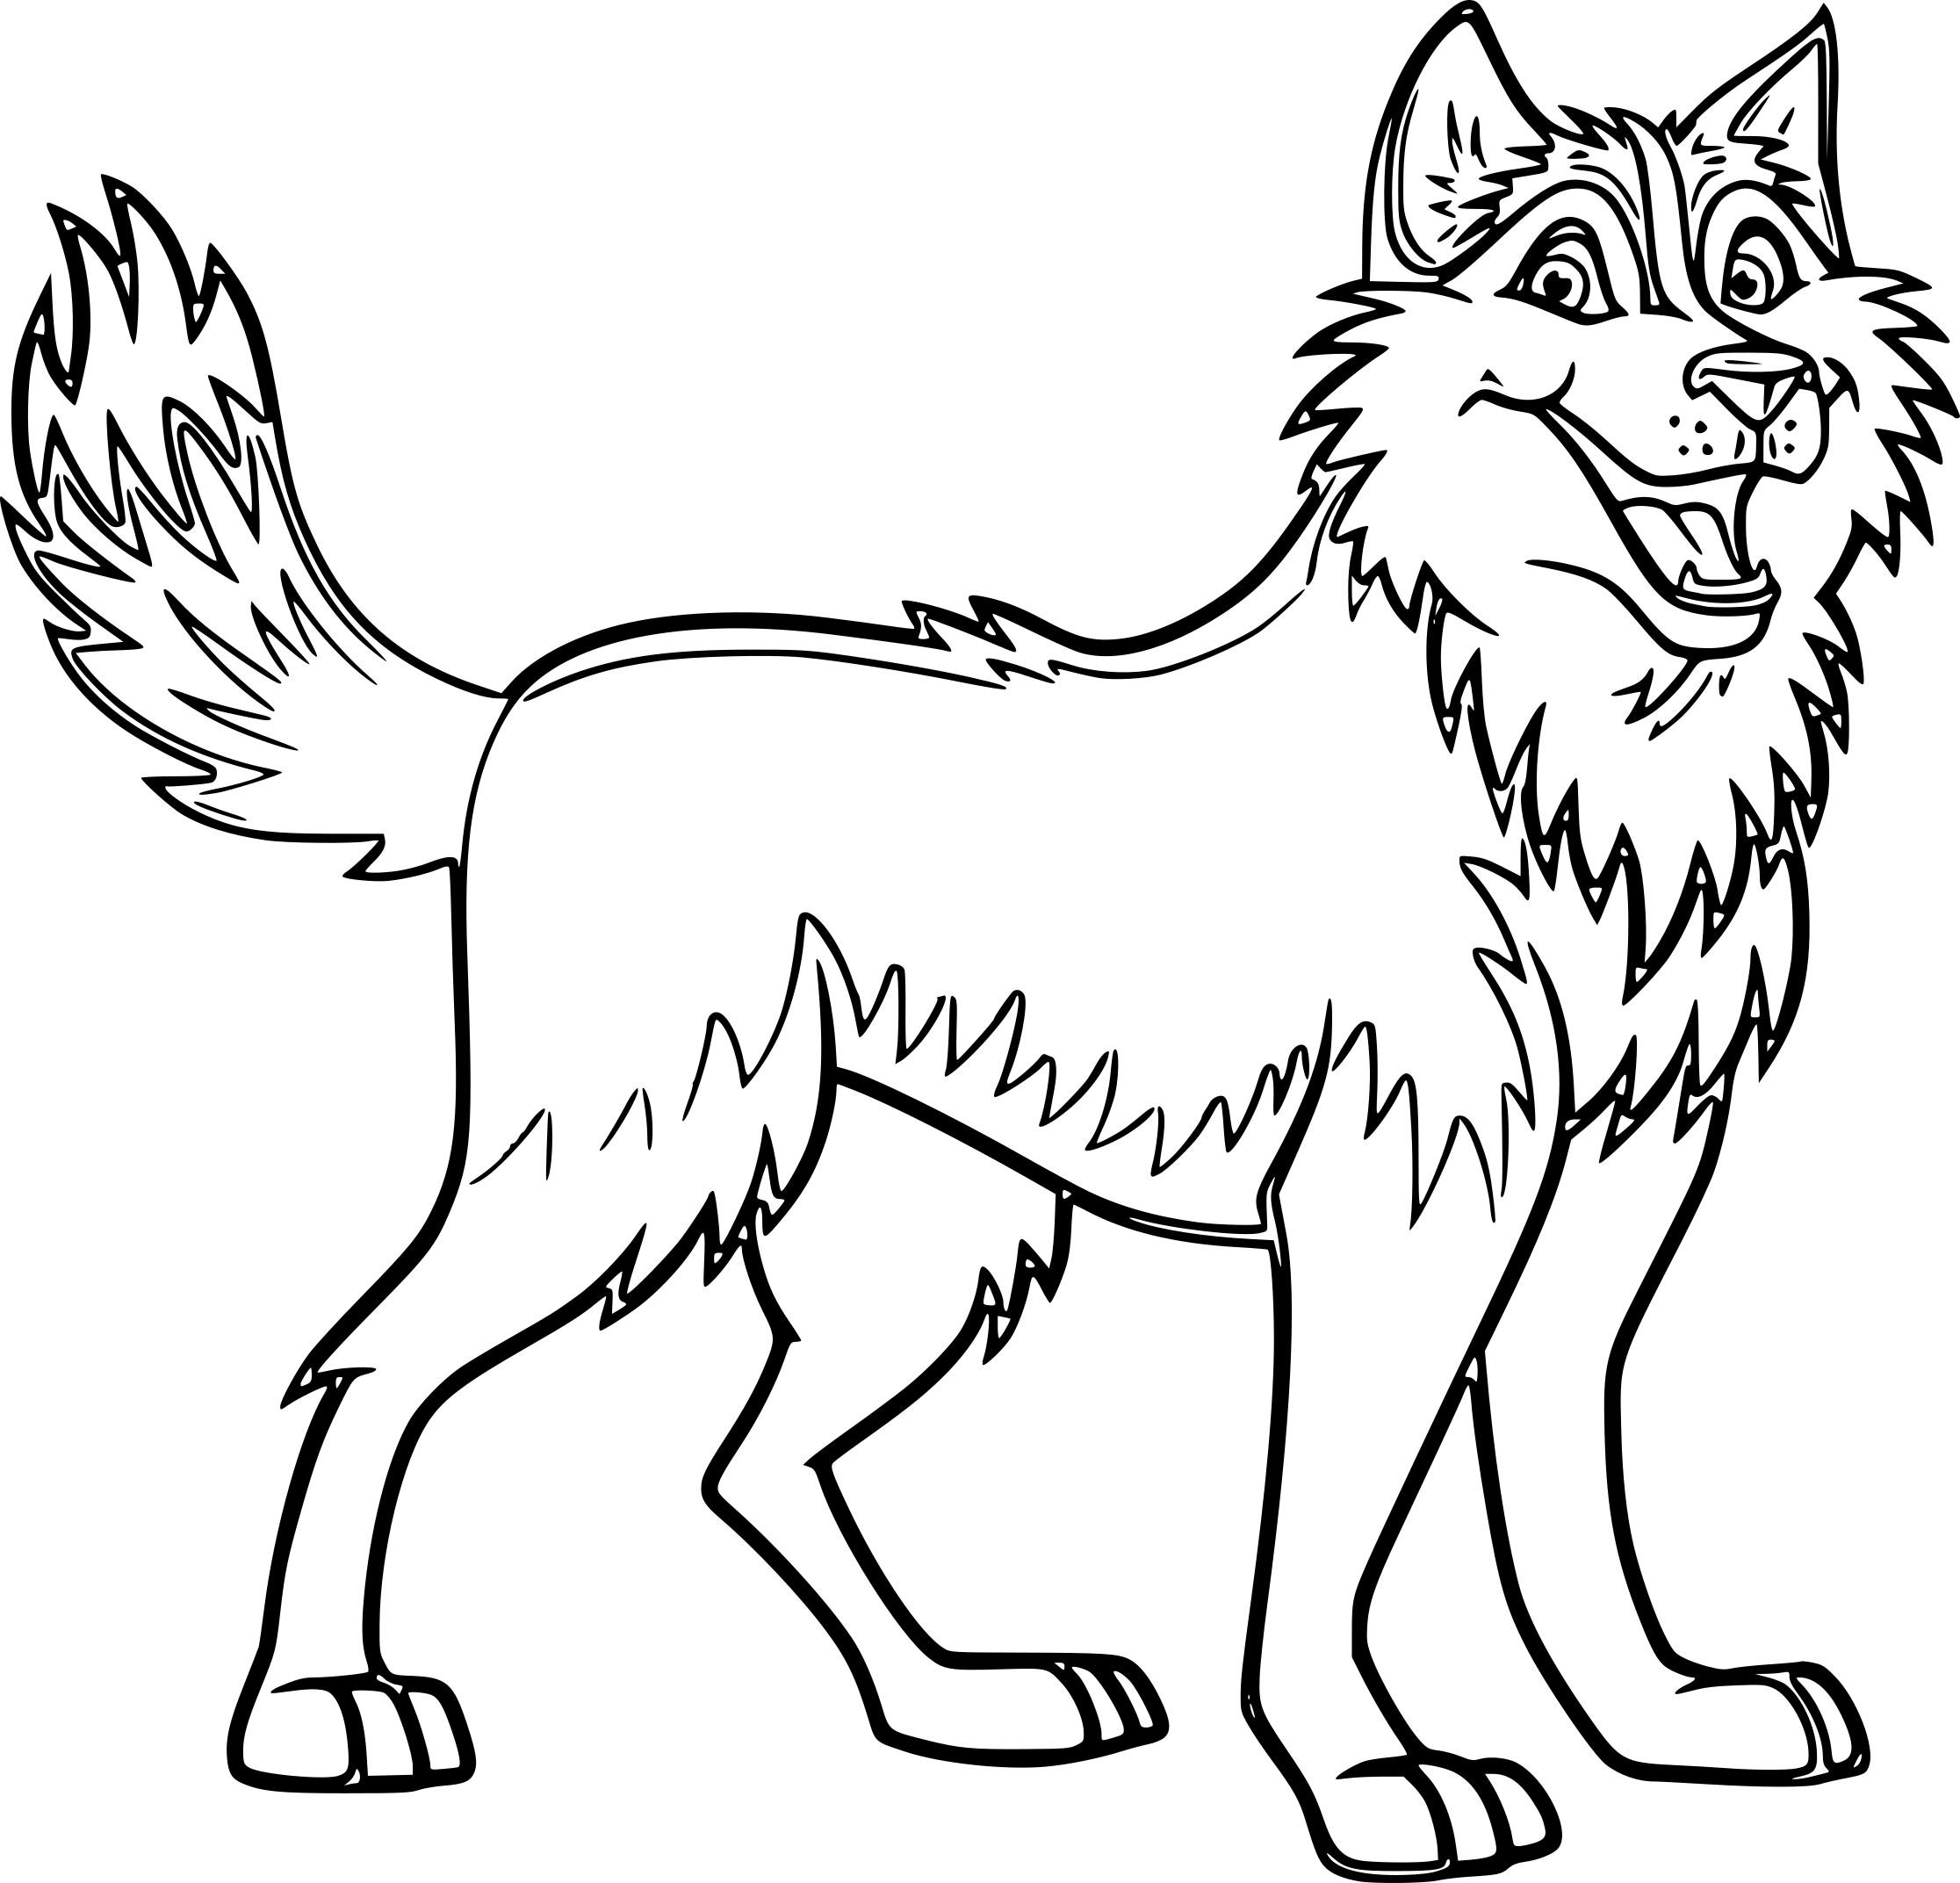 chien husky - Coloriage Chien